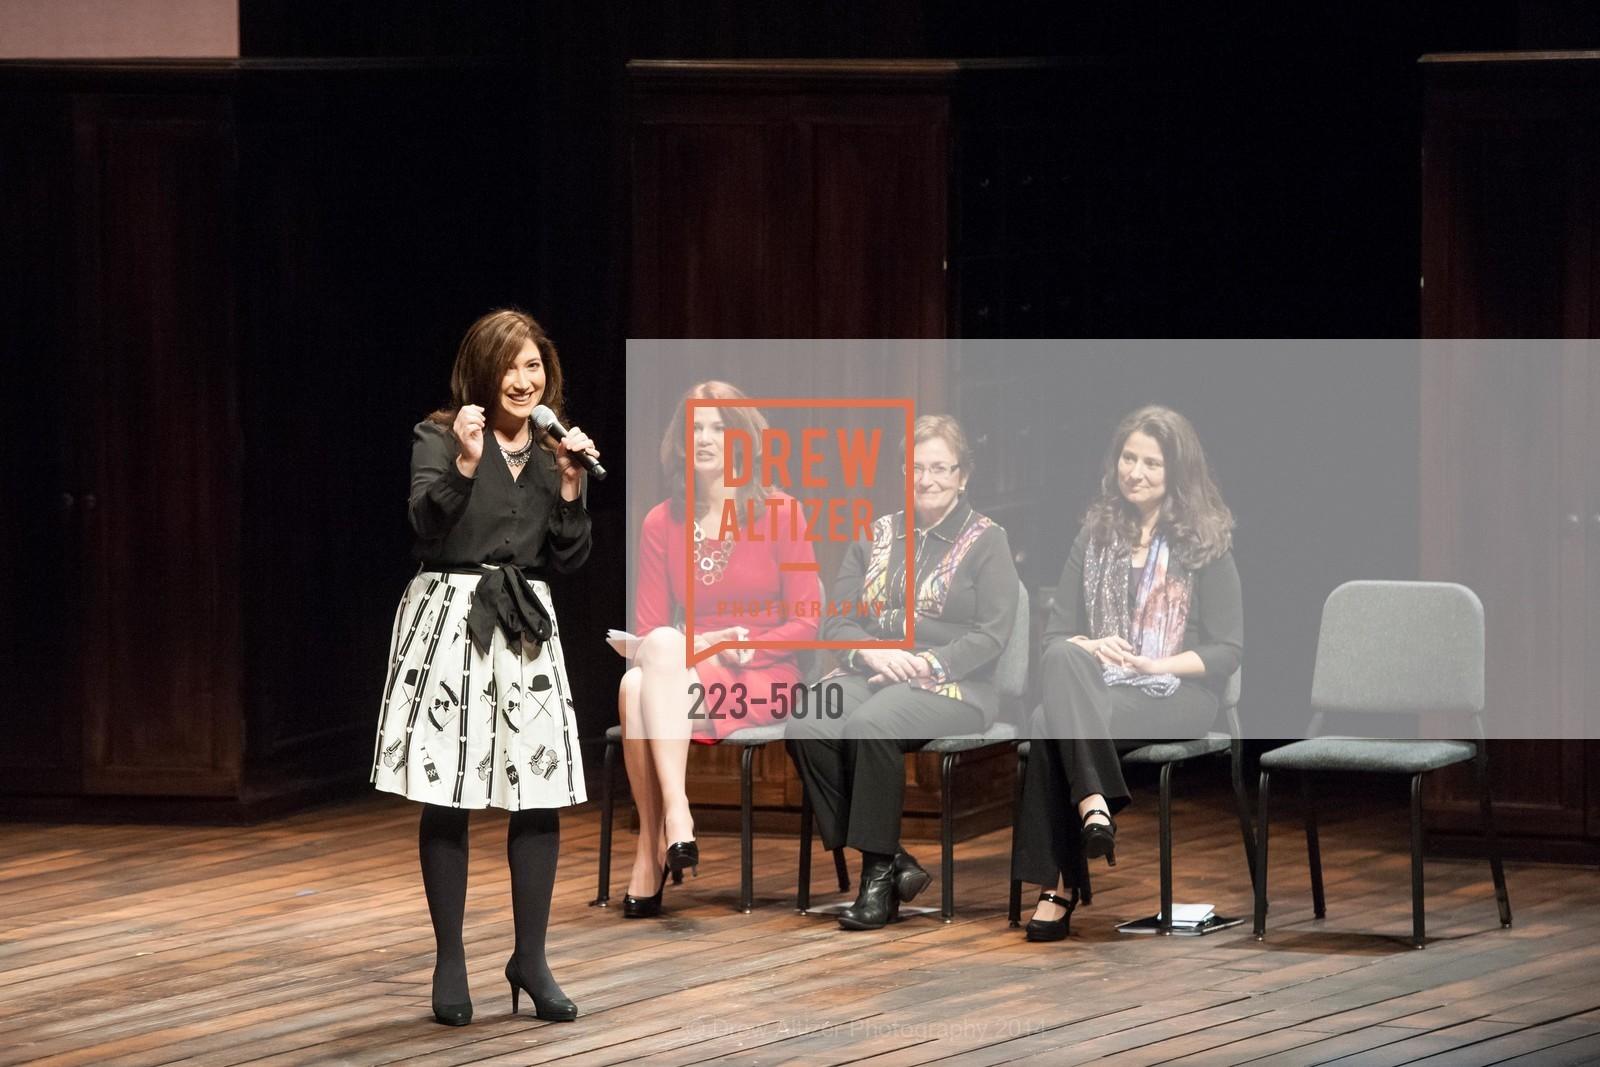 Randi Zuckerberg, Jenny Dearborn, Ann Bowers, Natalie Batalha, Photo #223-5010